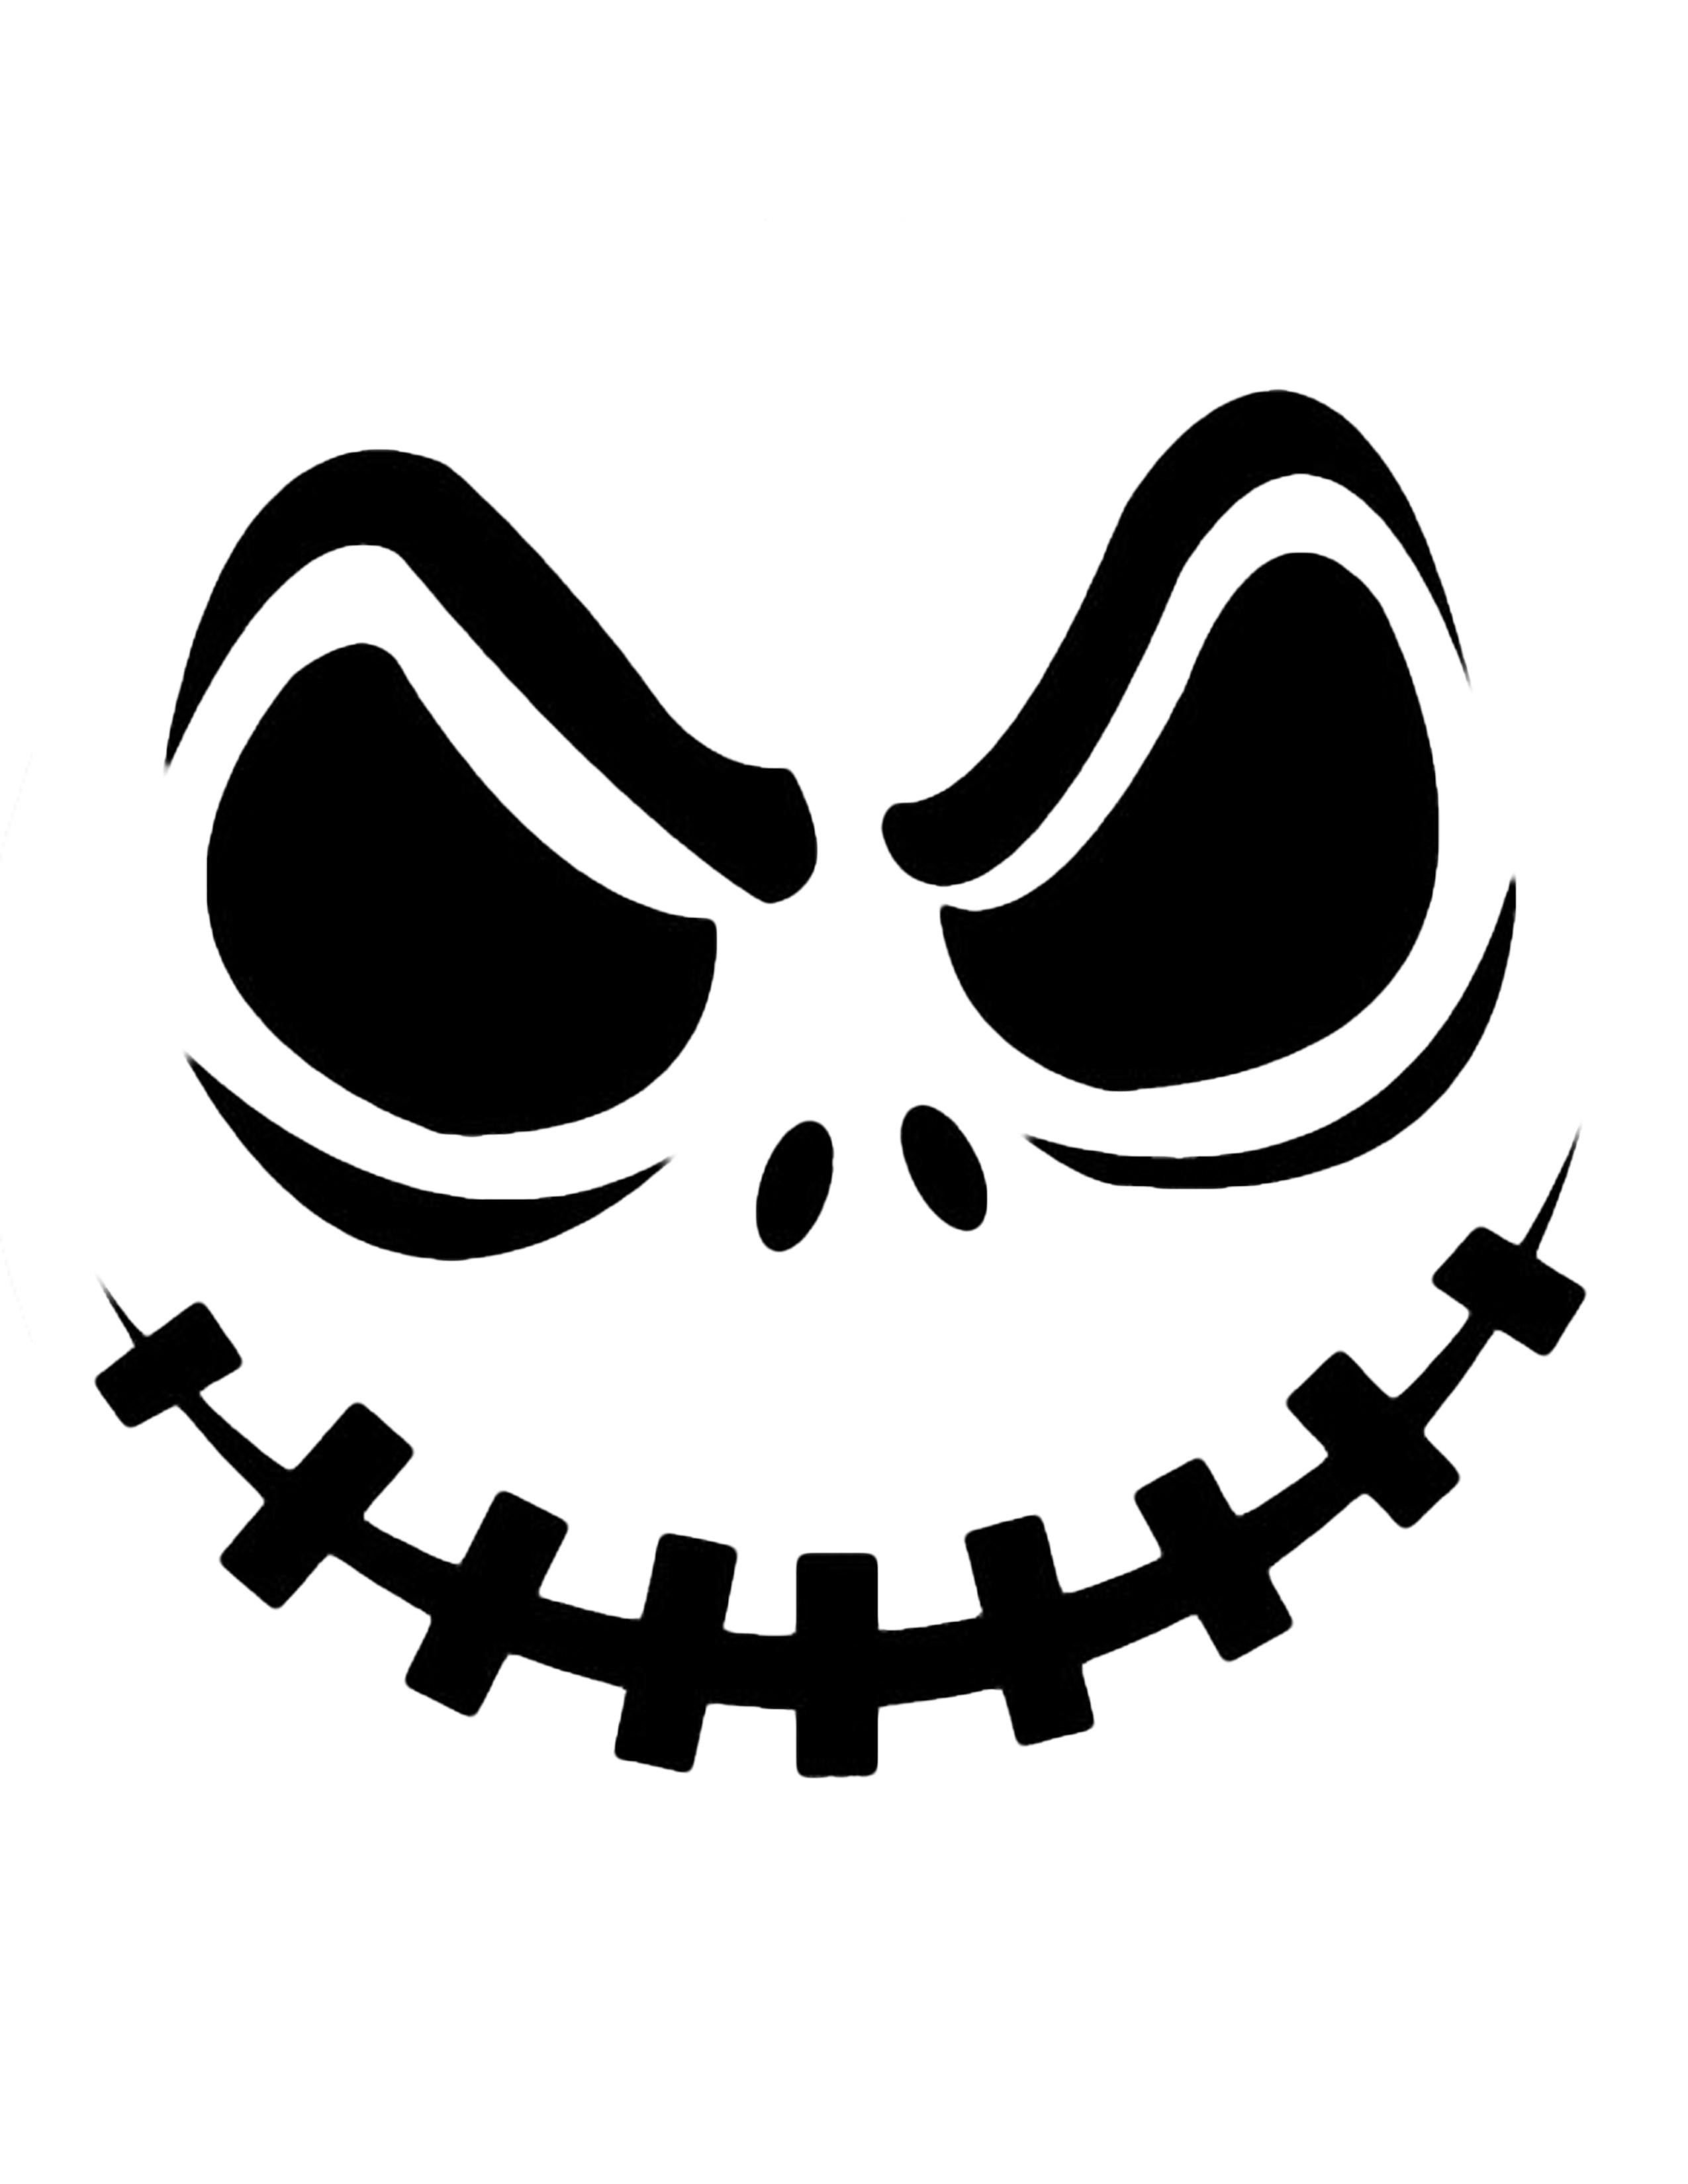 Scary Halloween Clipart Black .-Scary Halloween Clipart Black .-16